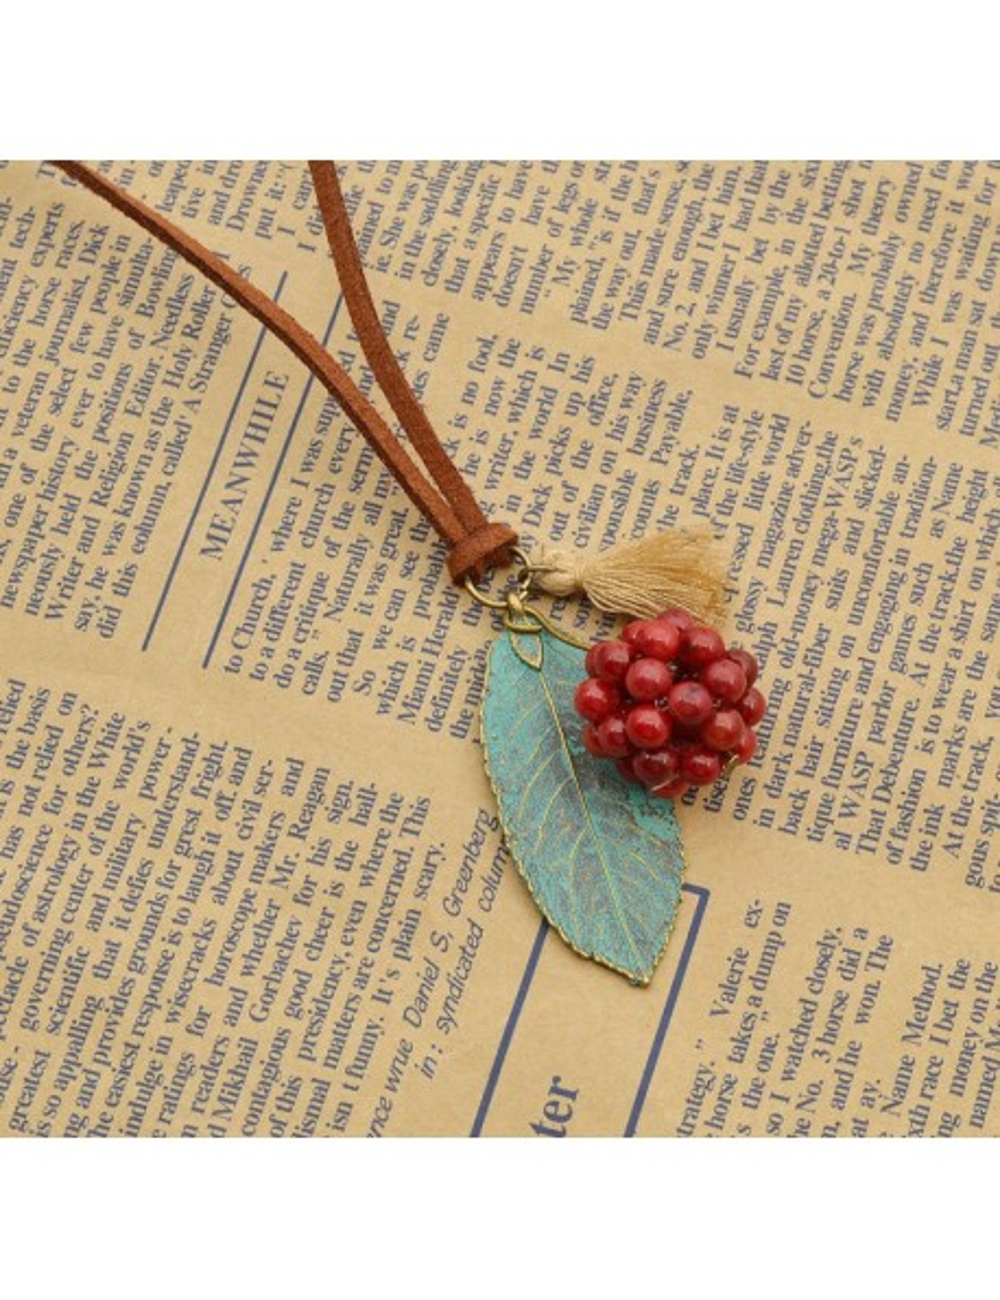 Collar de hoja turquesa y avellana roja